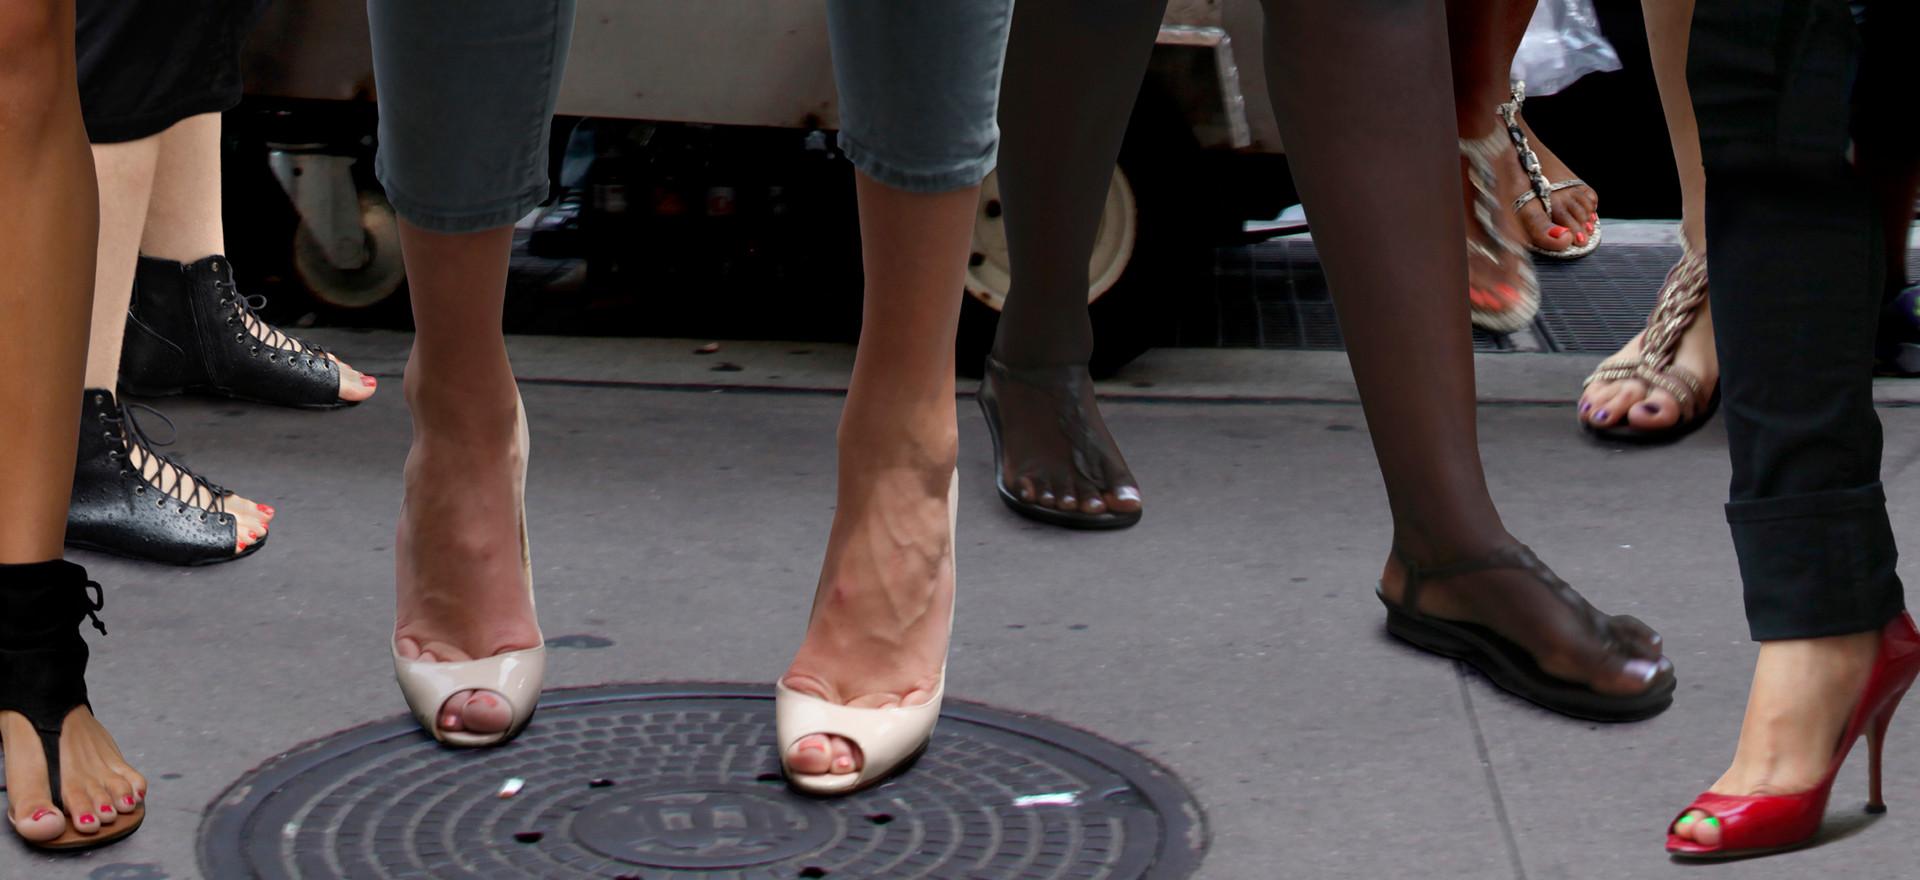 nyshoes1.jpg